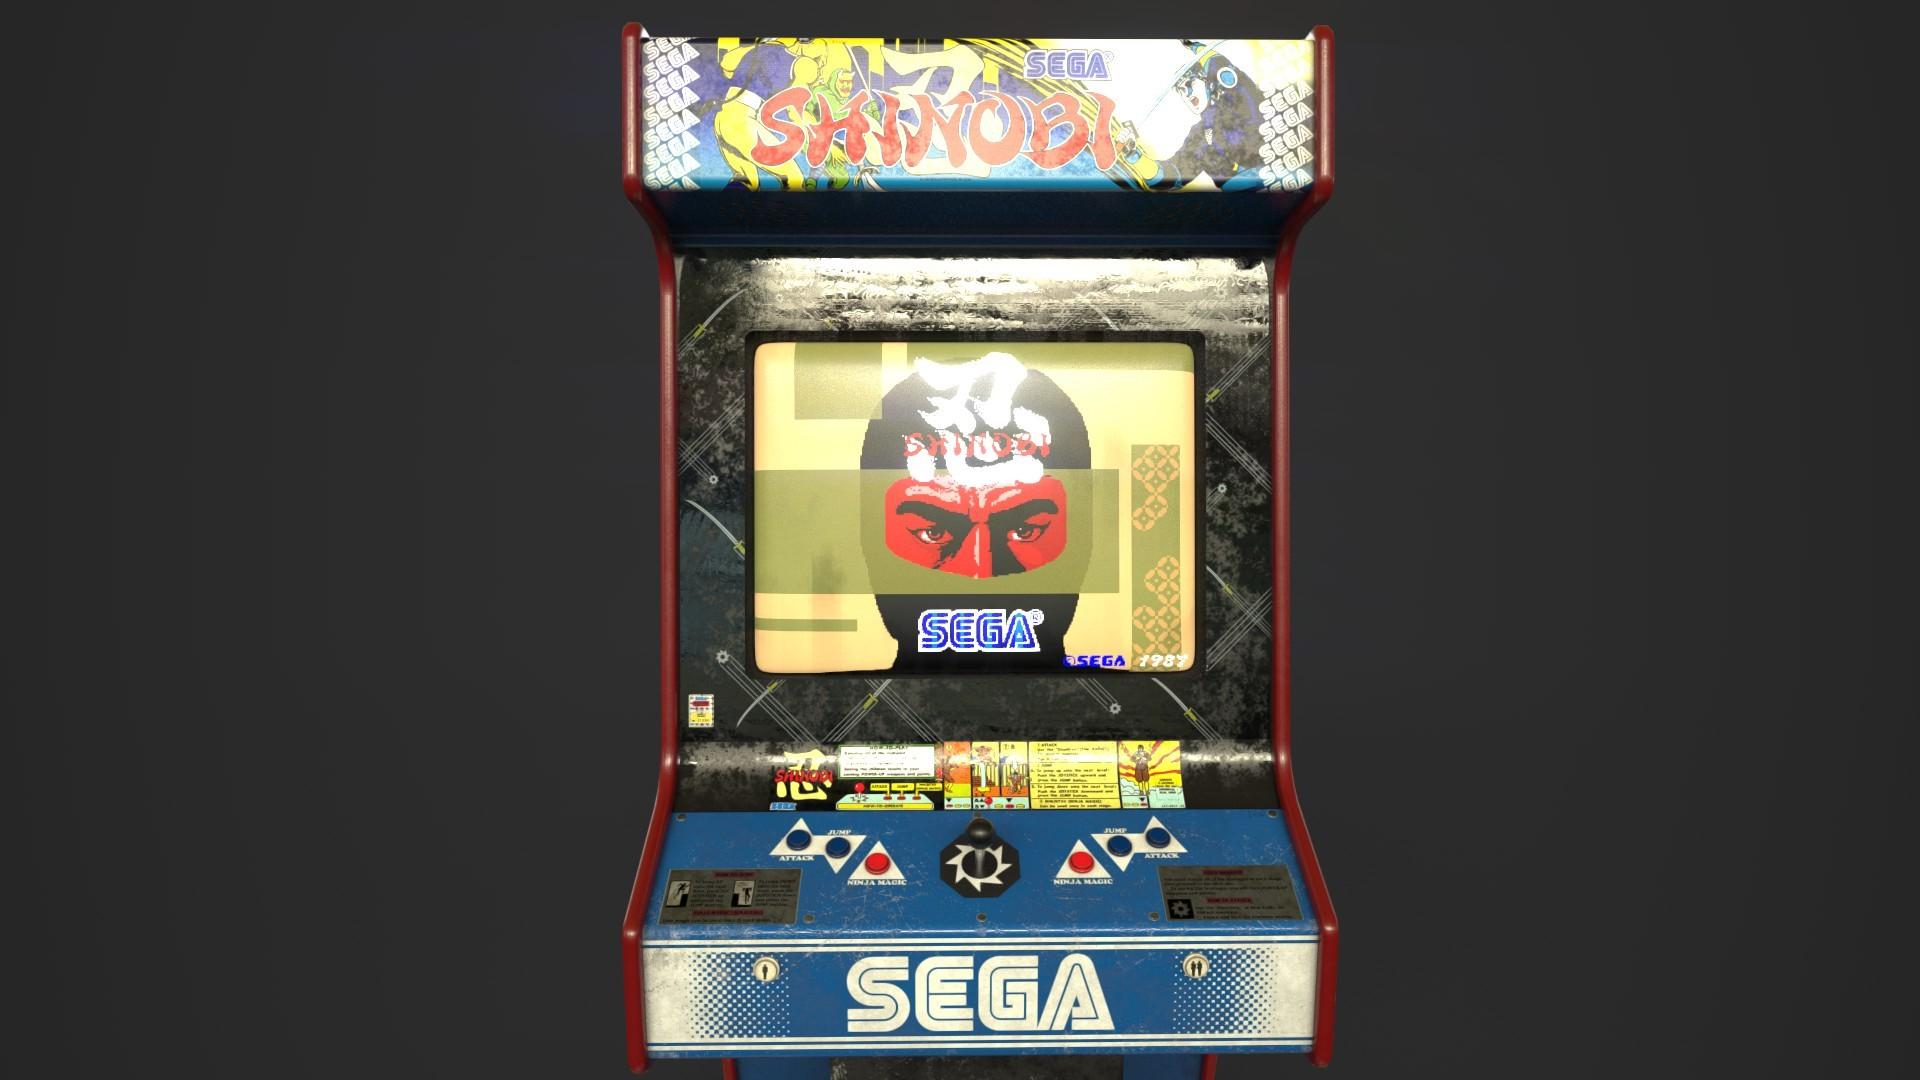 Alan Mealor Shinobi Arcade Cabinet Updated